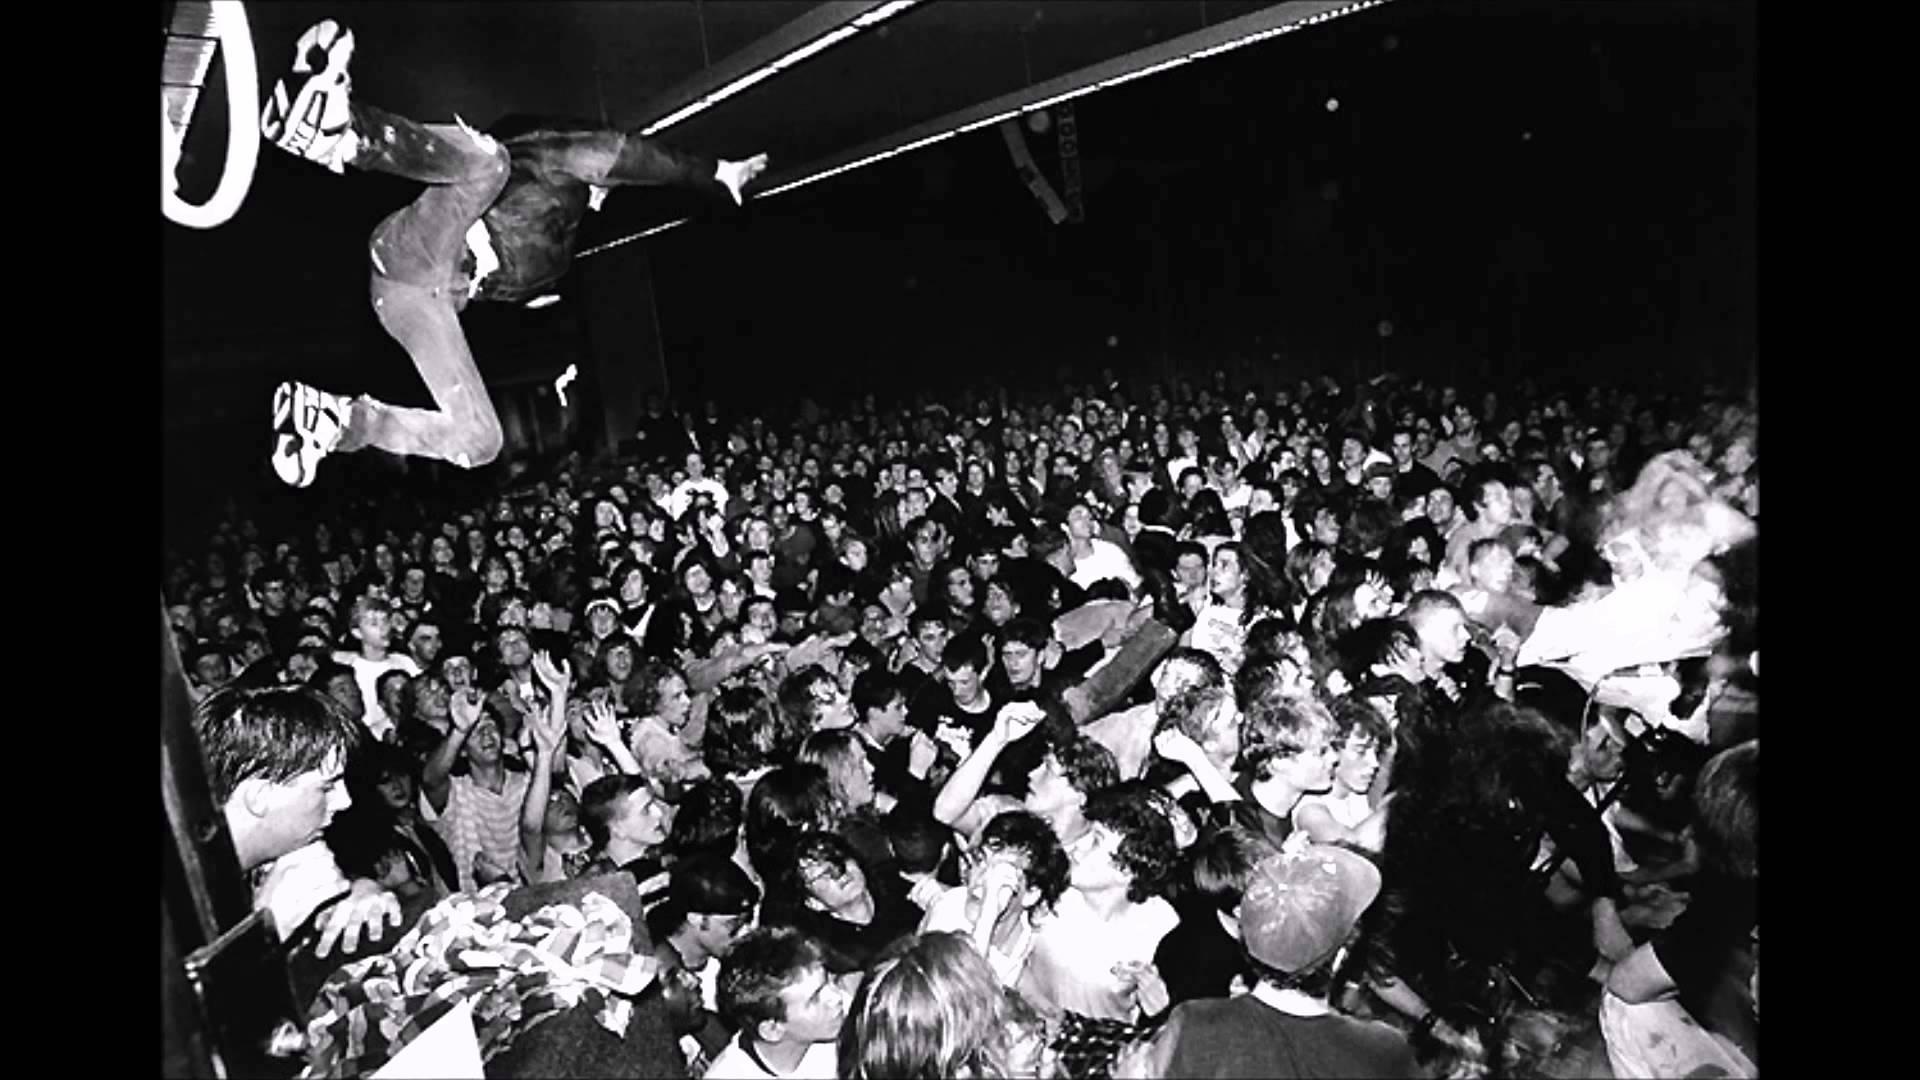 Grunge scene photo